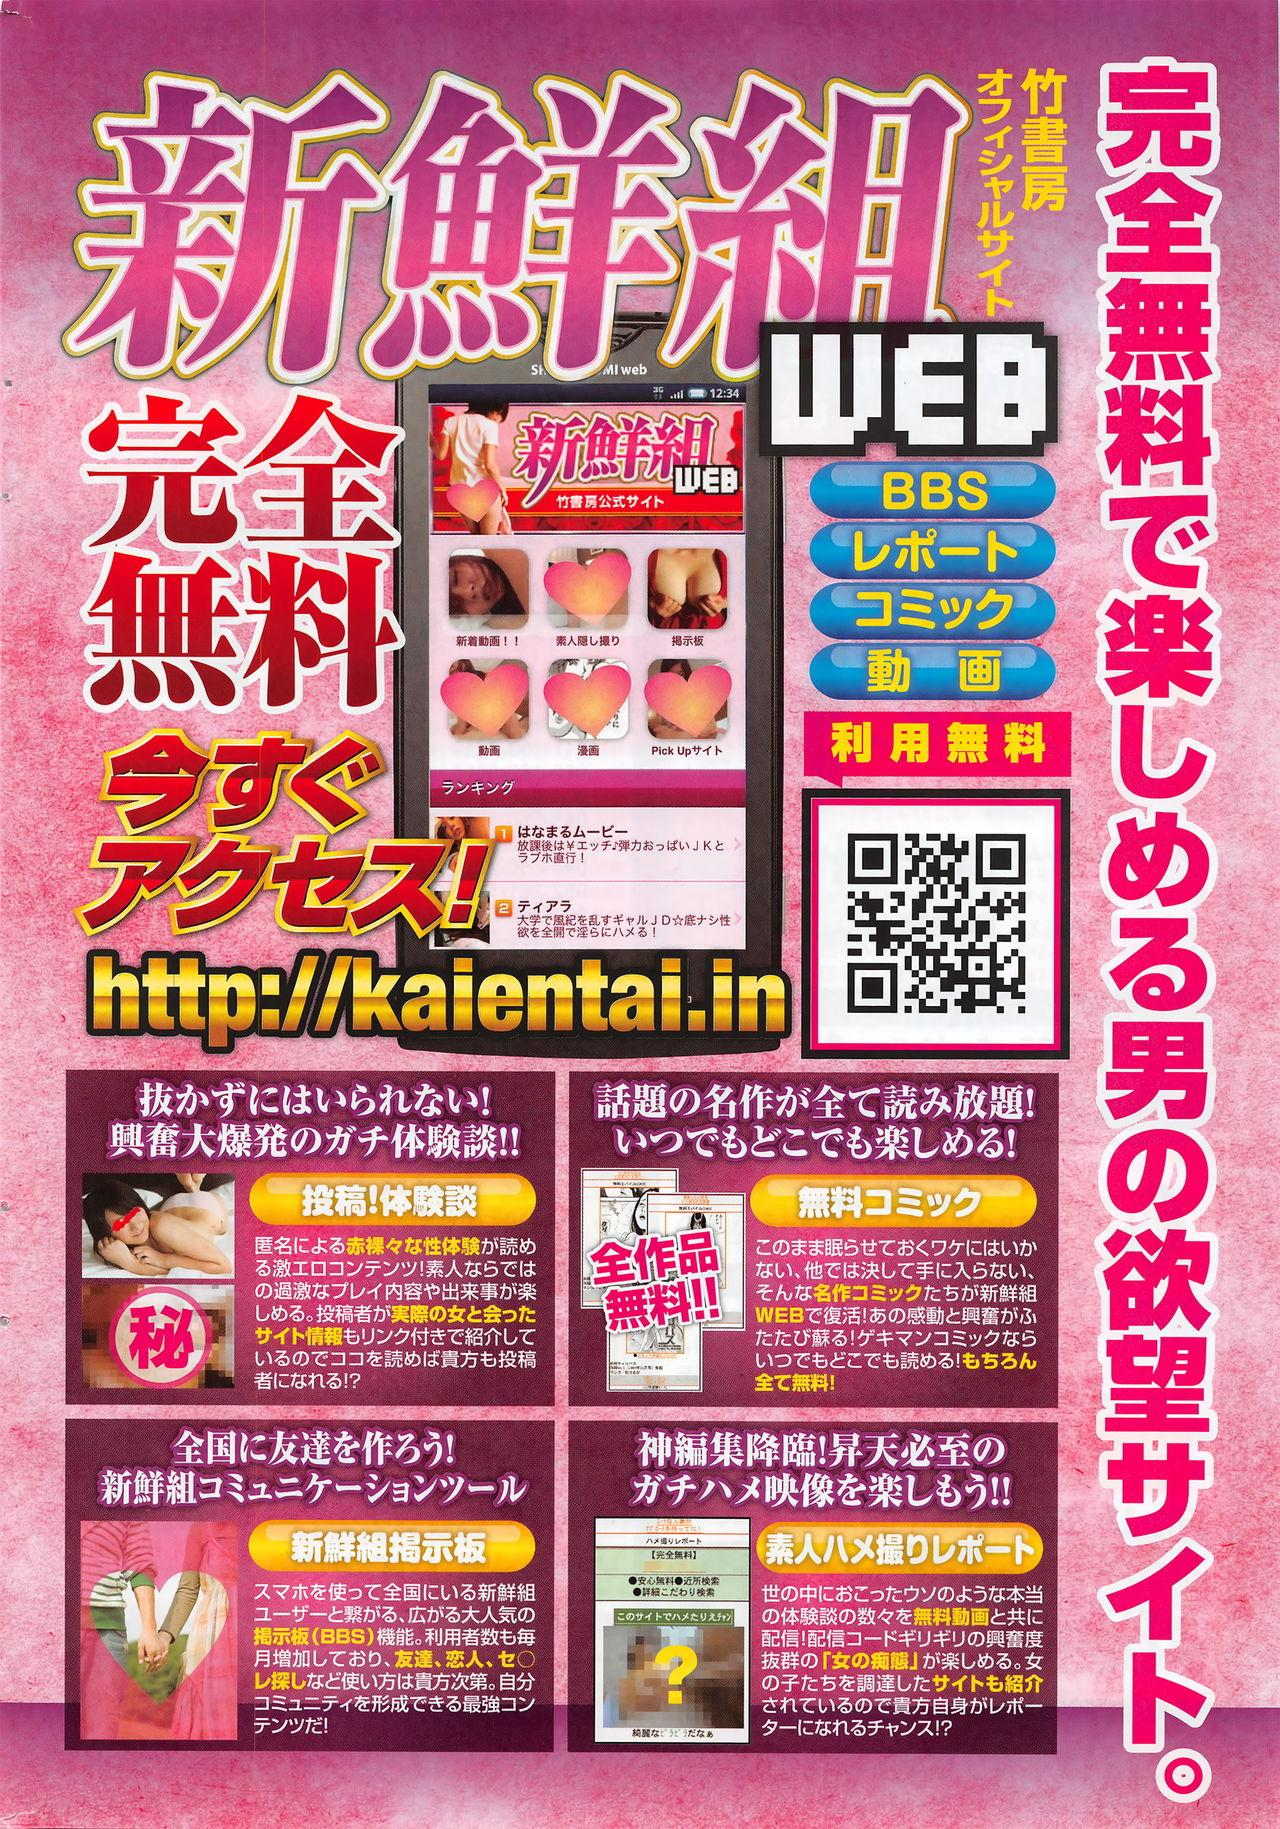 Monthly Vitaman 2016-03 248